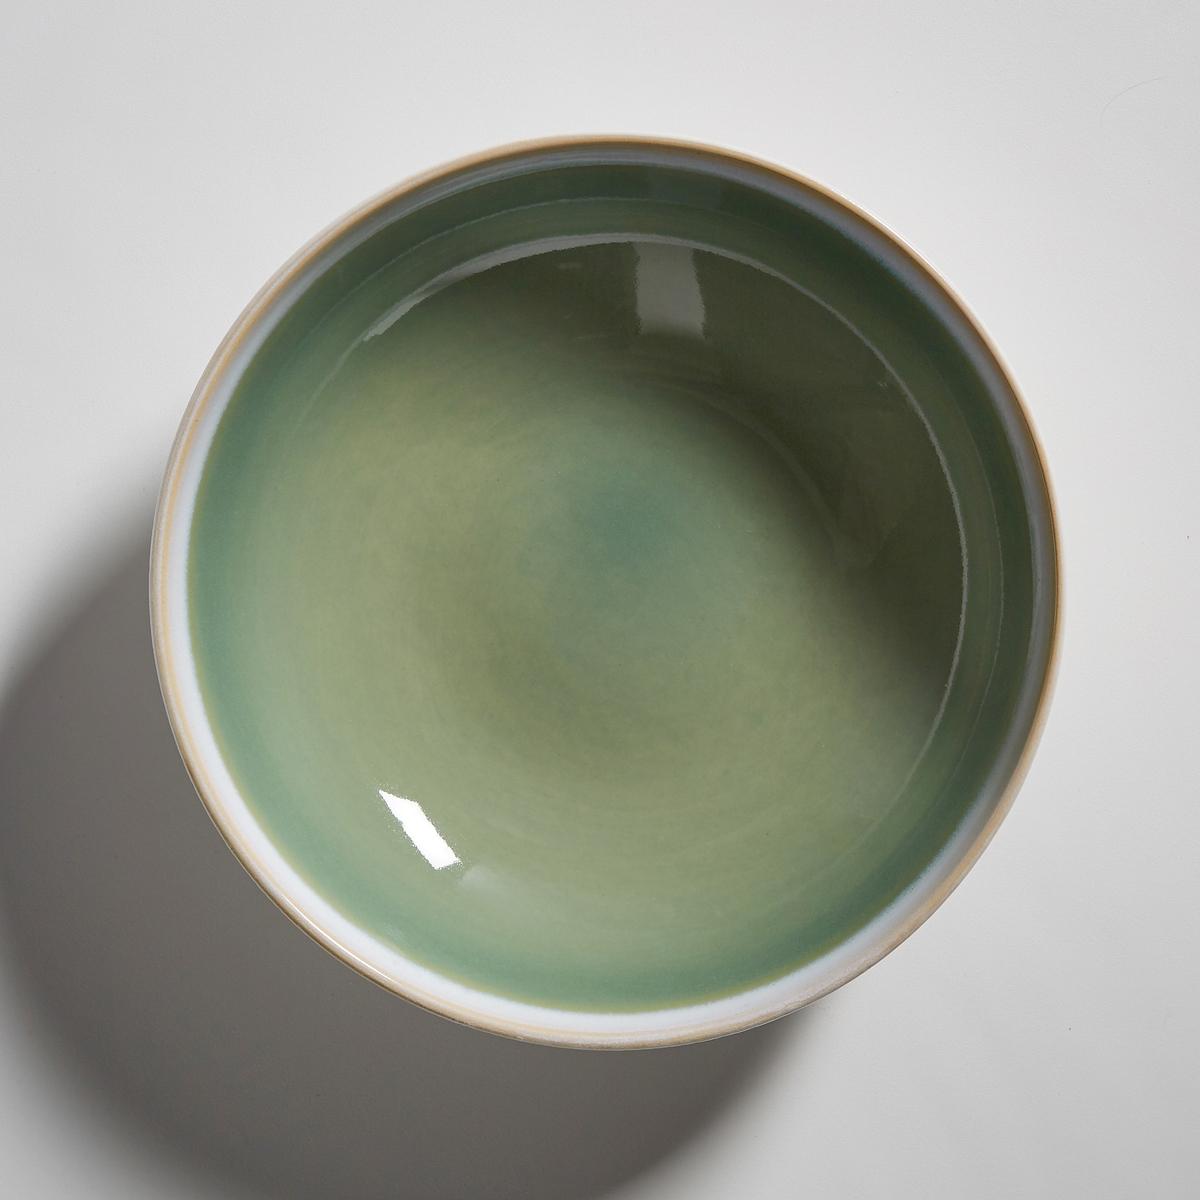 4 тарелки глубокие из керамики, Déonie